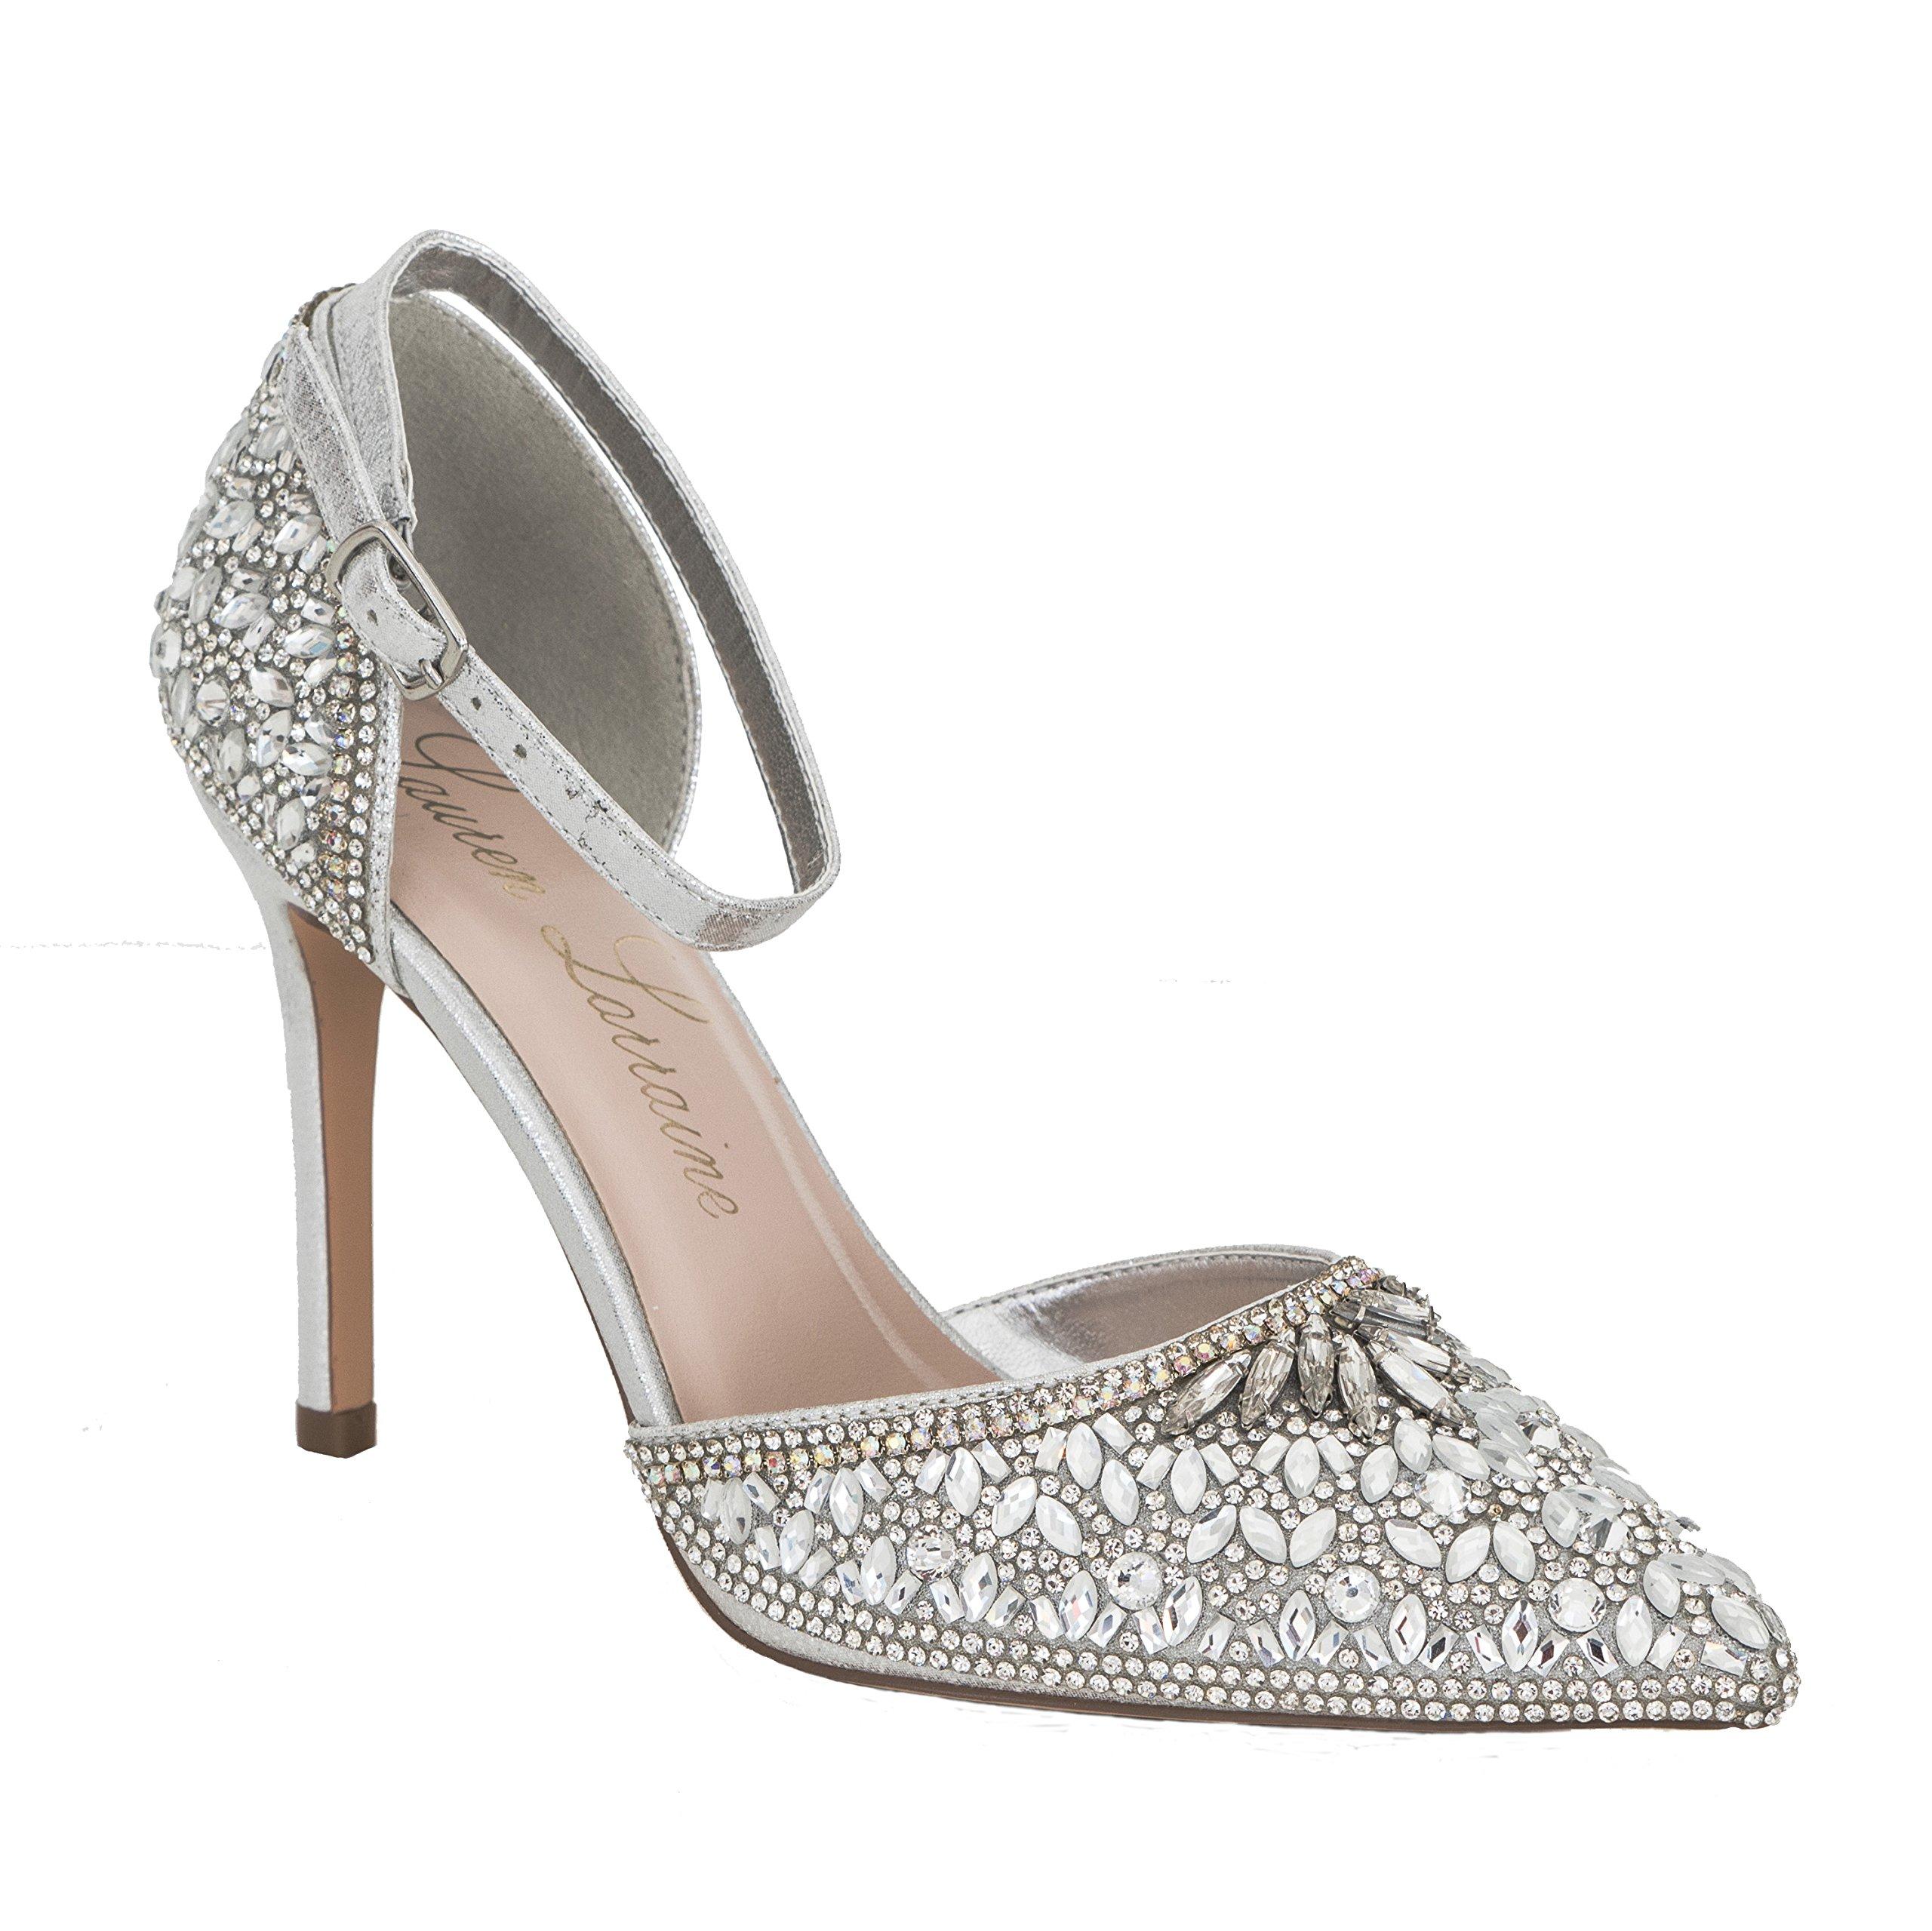 Lauren Lorraine Rose Crystal Women's Evening Dress Rosegold High Heel Ankle Strap D'Orsay Pointed Toe Wedding Pump Silver Size 9.5